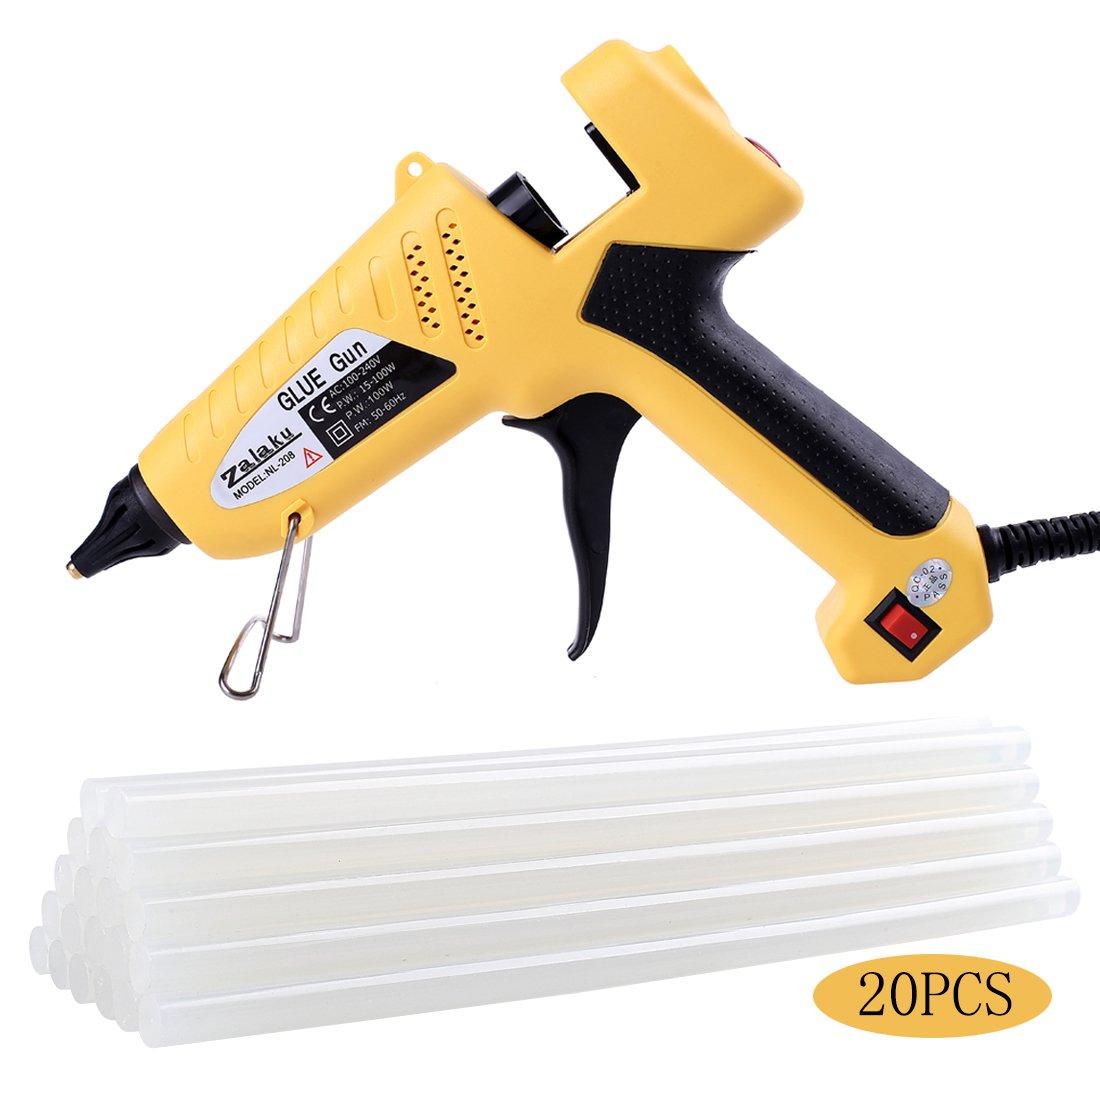 Zalaku 100 Watt Hot Glue Gun with 20pcs Glue Sticks High Temperature Hot Melt Glue Gun for Arts & Crafts, & Sealing and Quick Repairs